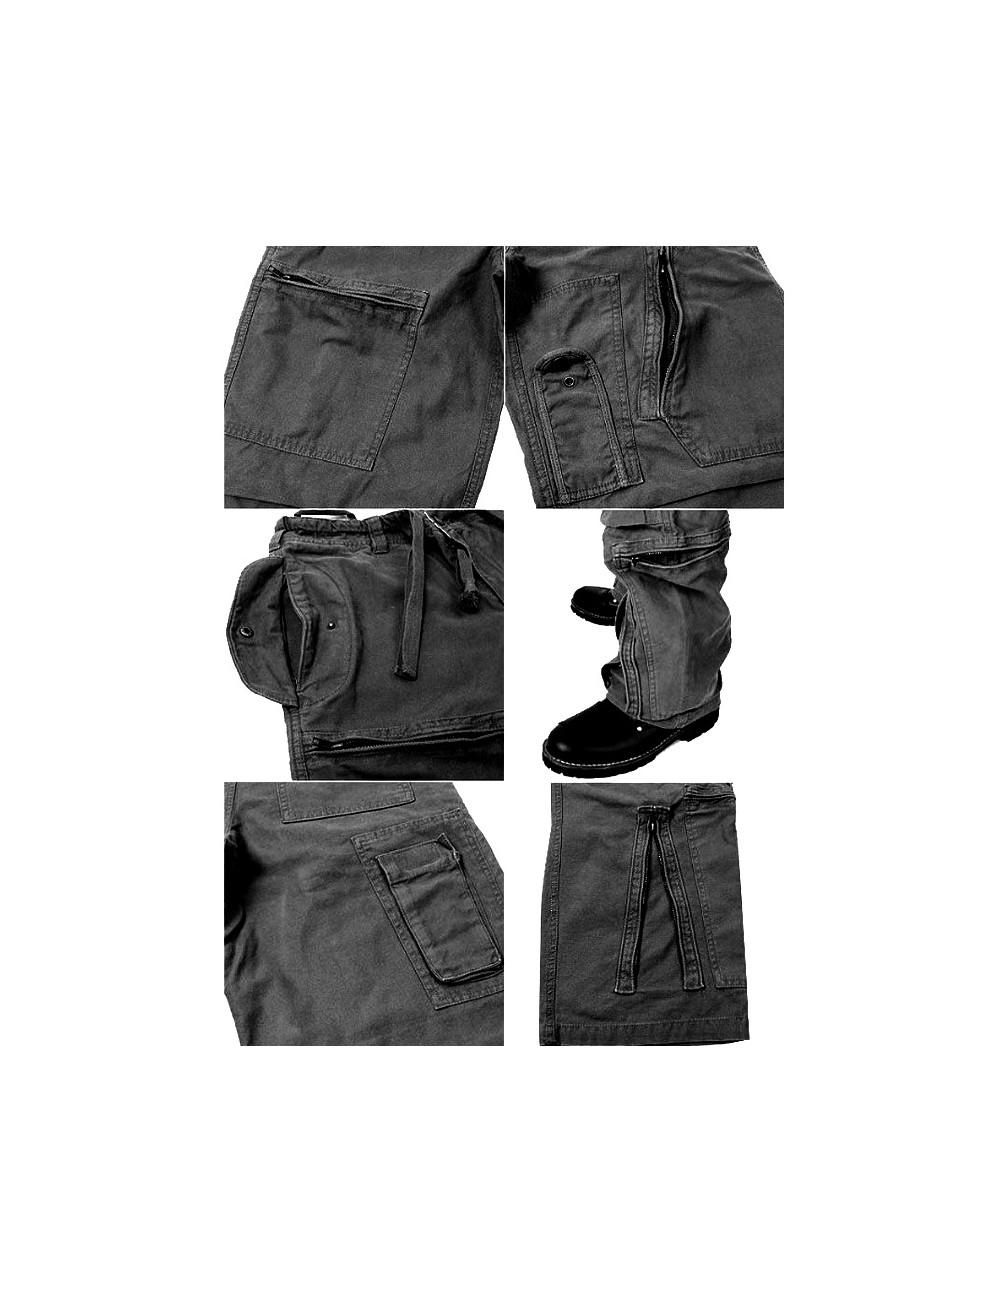 160th Special Operations Aviation Regiment Mens Active Long Pants Casual/ï/¼/ŒFashion Pants Jogger Sweatpants.